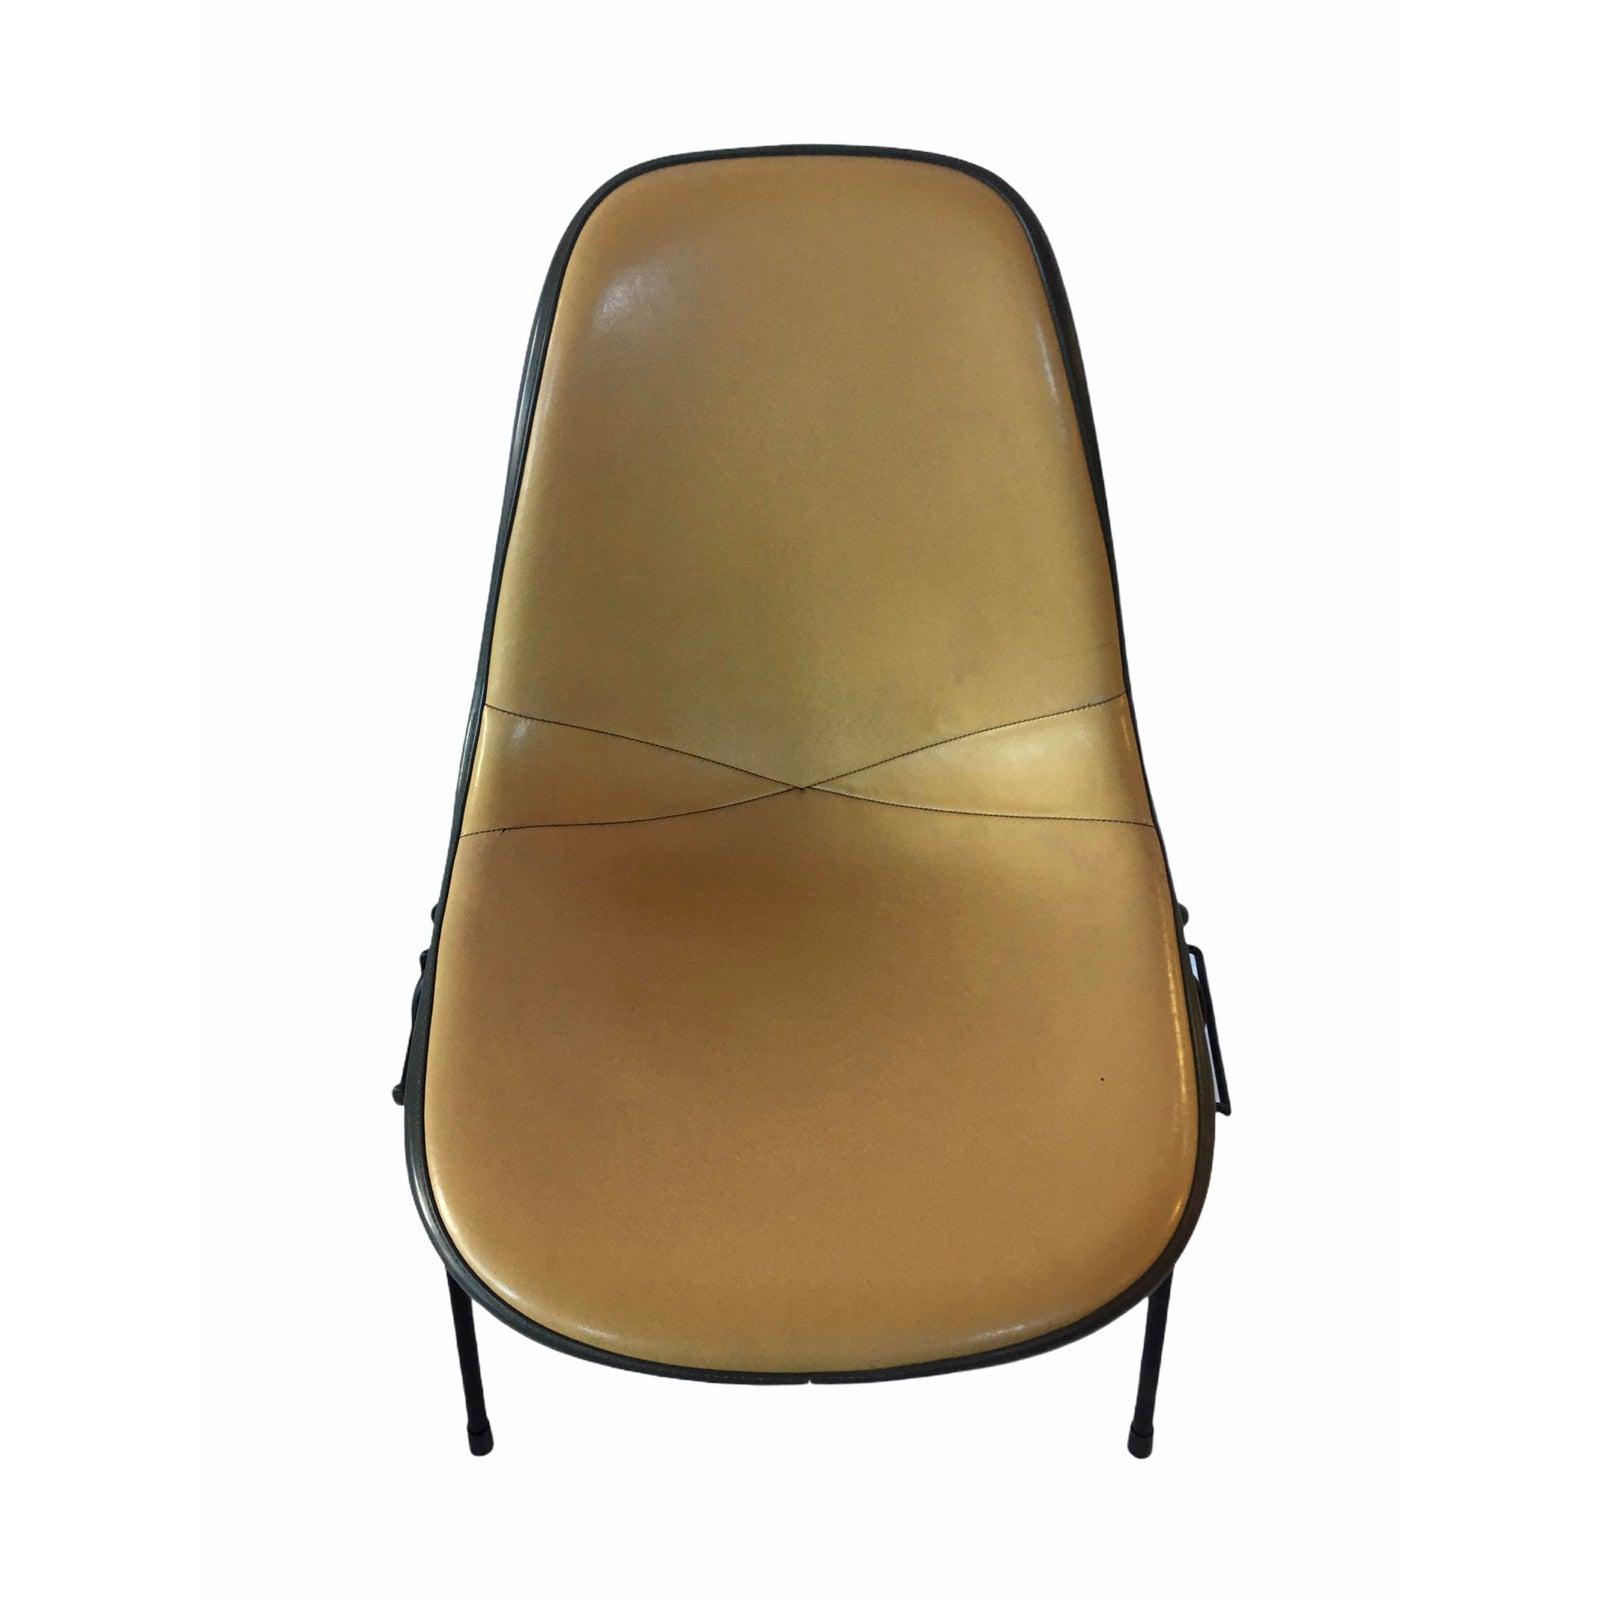 Beige 1960s Herman Miller Eames DSX (& Variants) Side